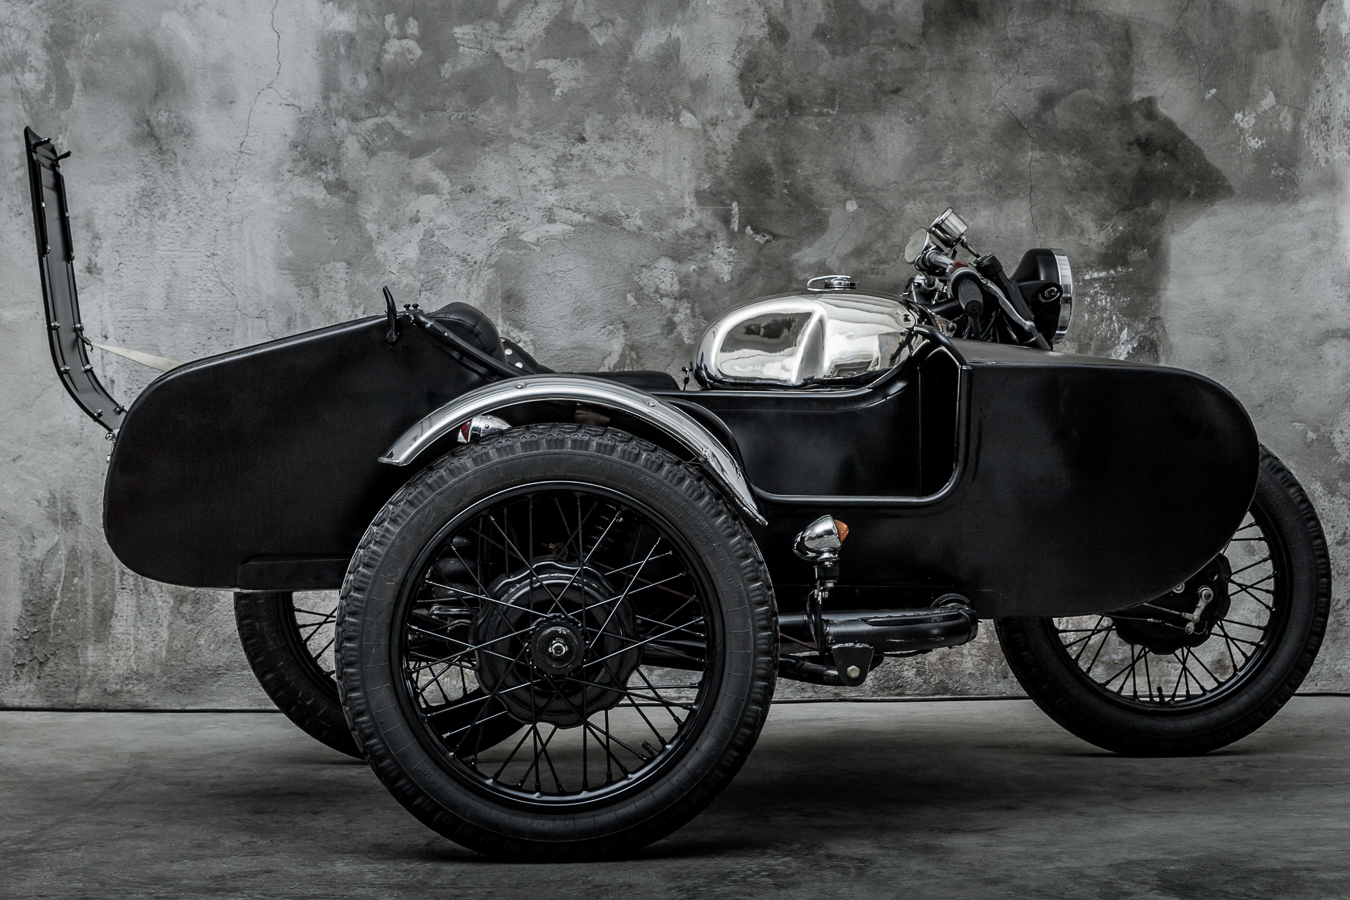 De Palma Cycles - Ural 650cc by Cristian Di Stefano